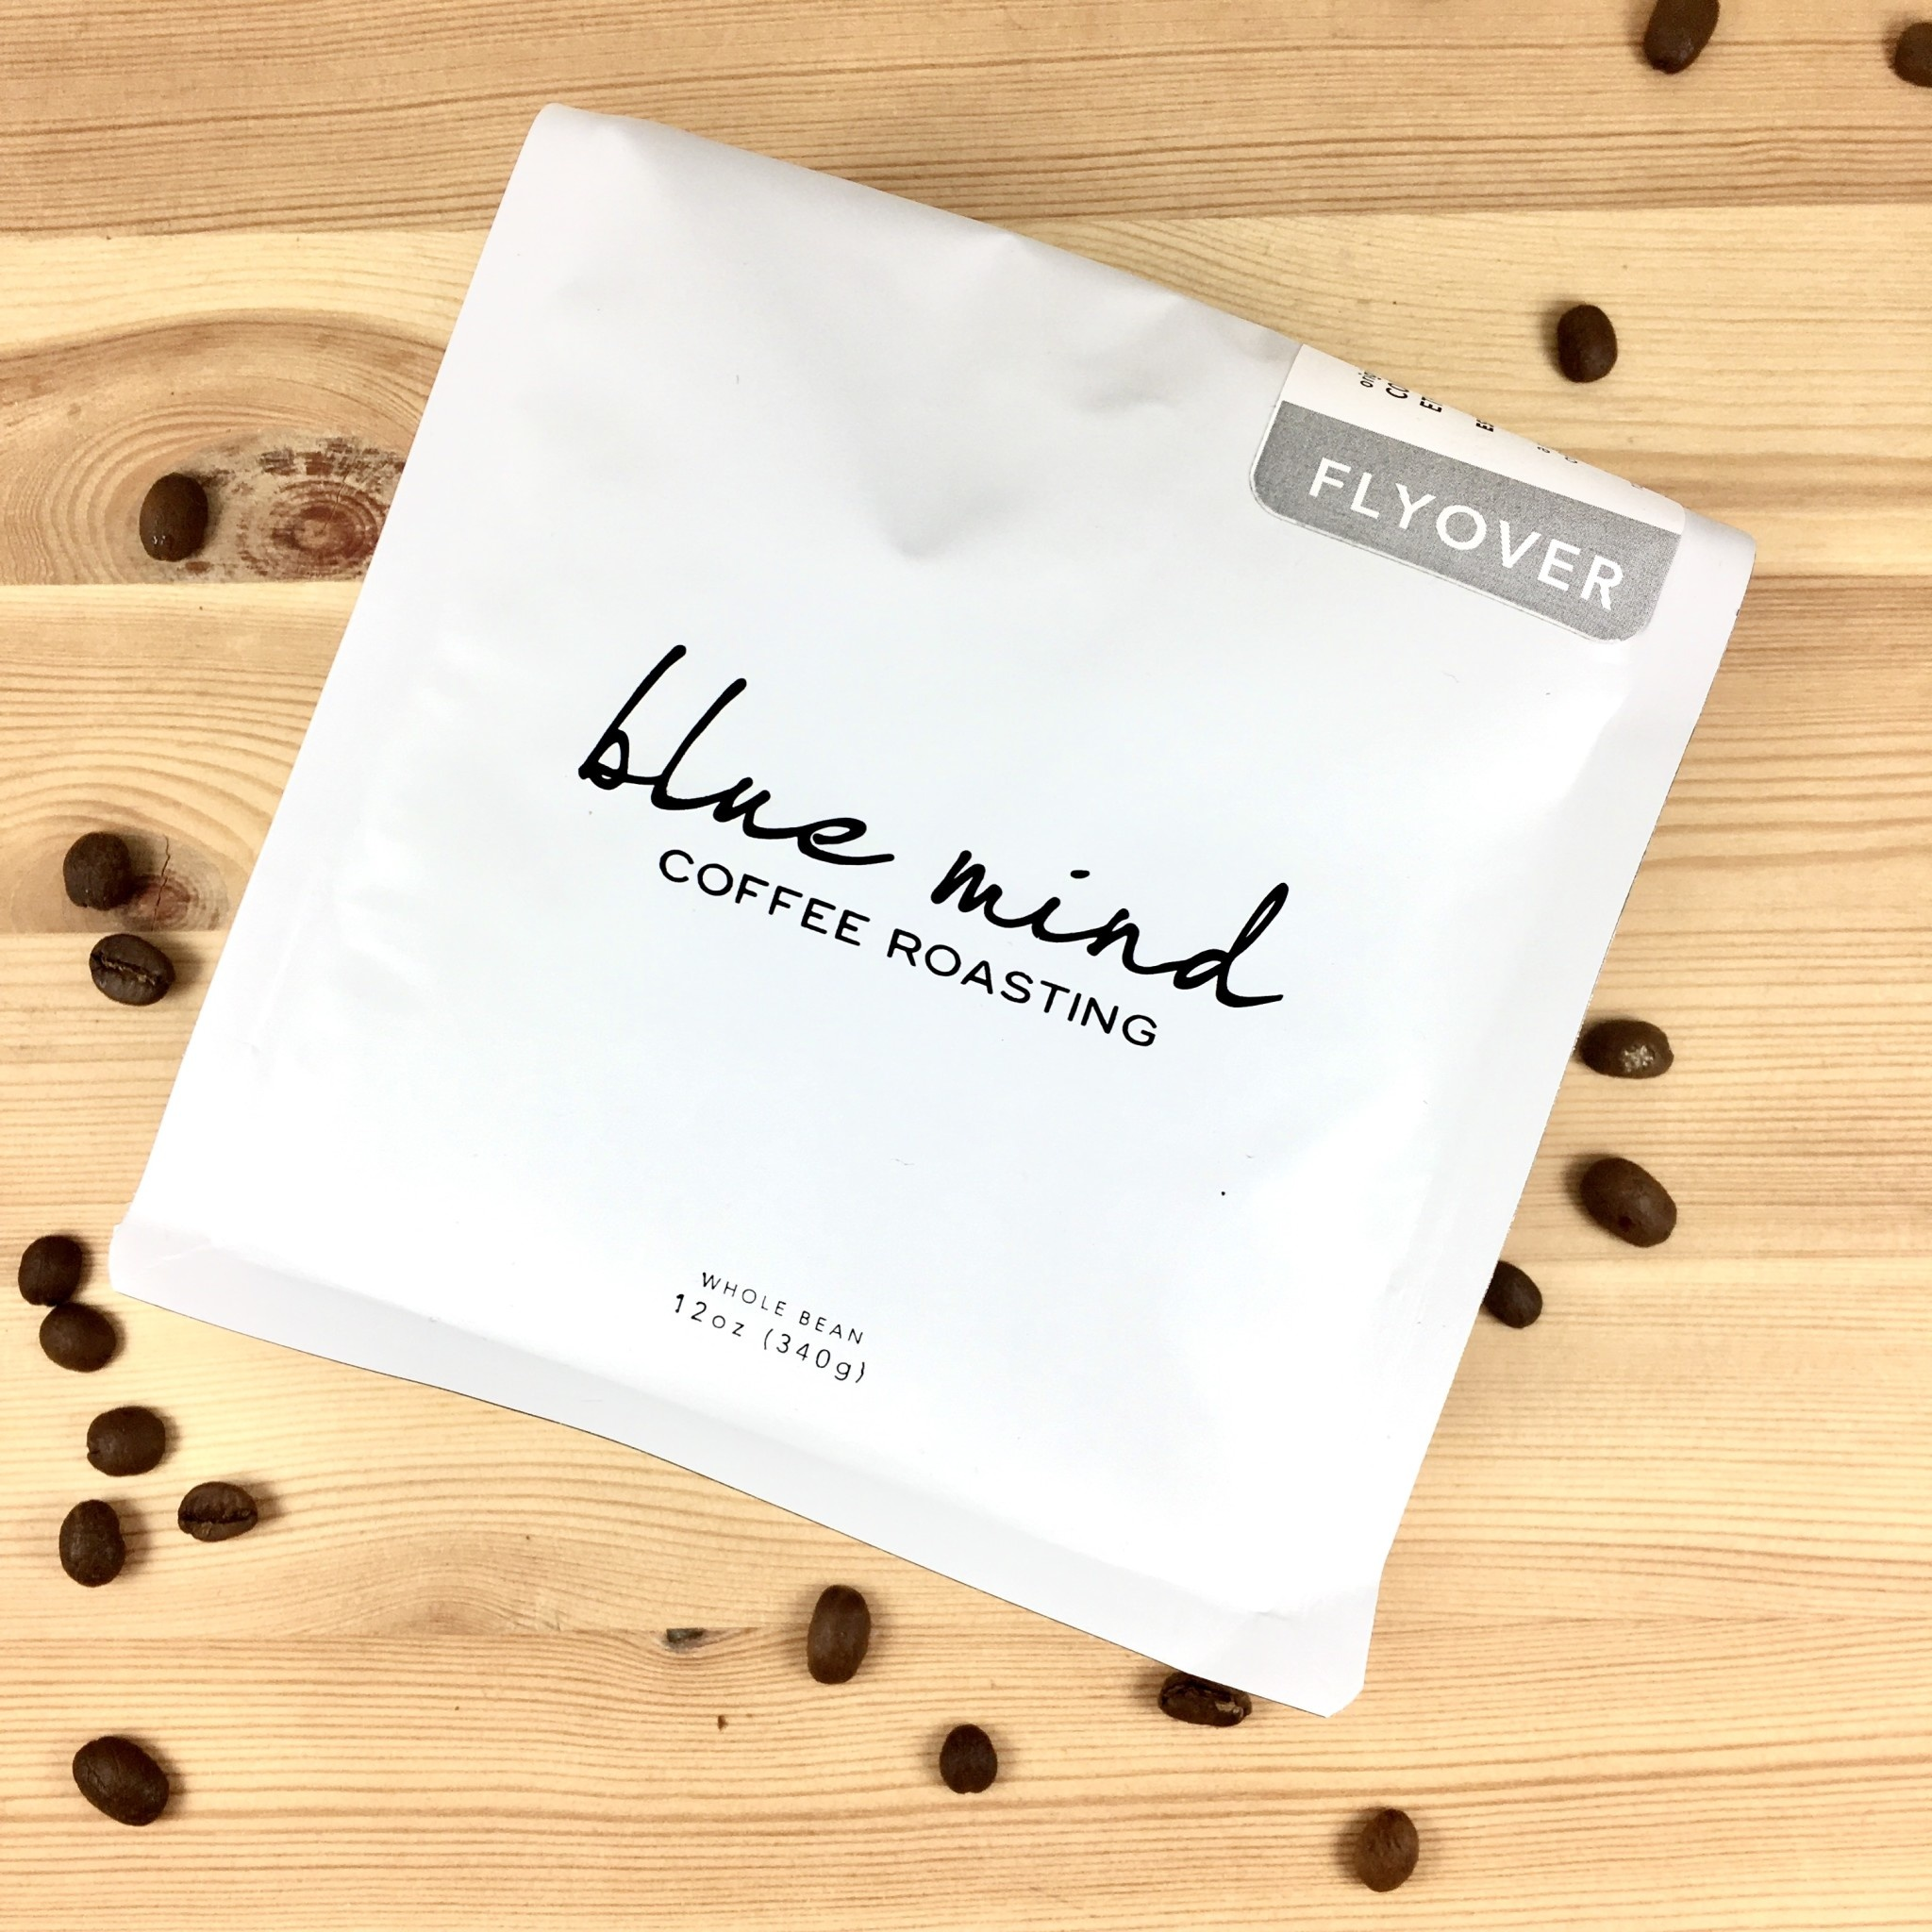 Blue Mind Roasting Flyover - Honduras Ethiopia Yirgacheffe Whole Bean Coffee Bag 12oz. Bag